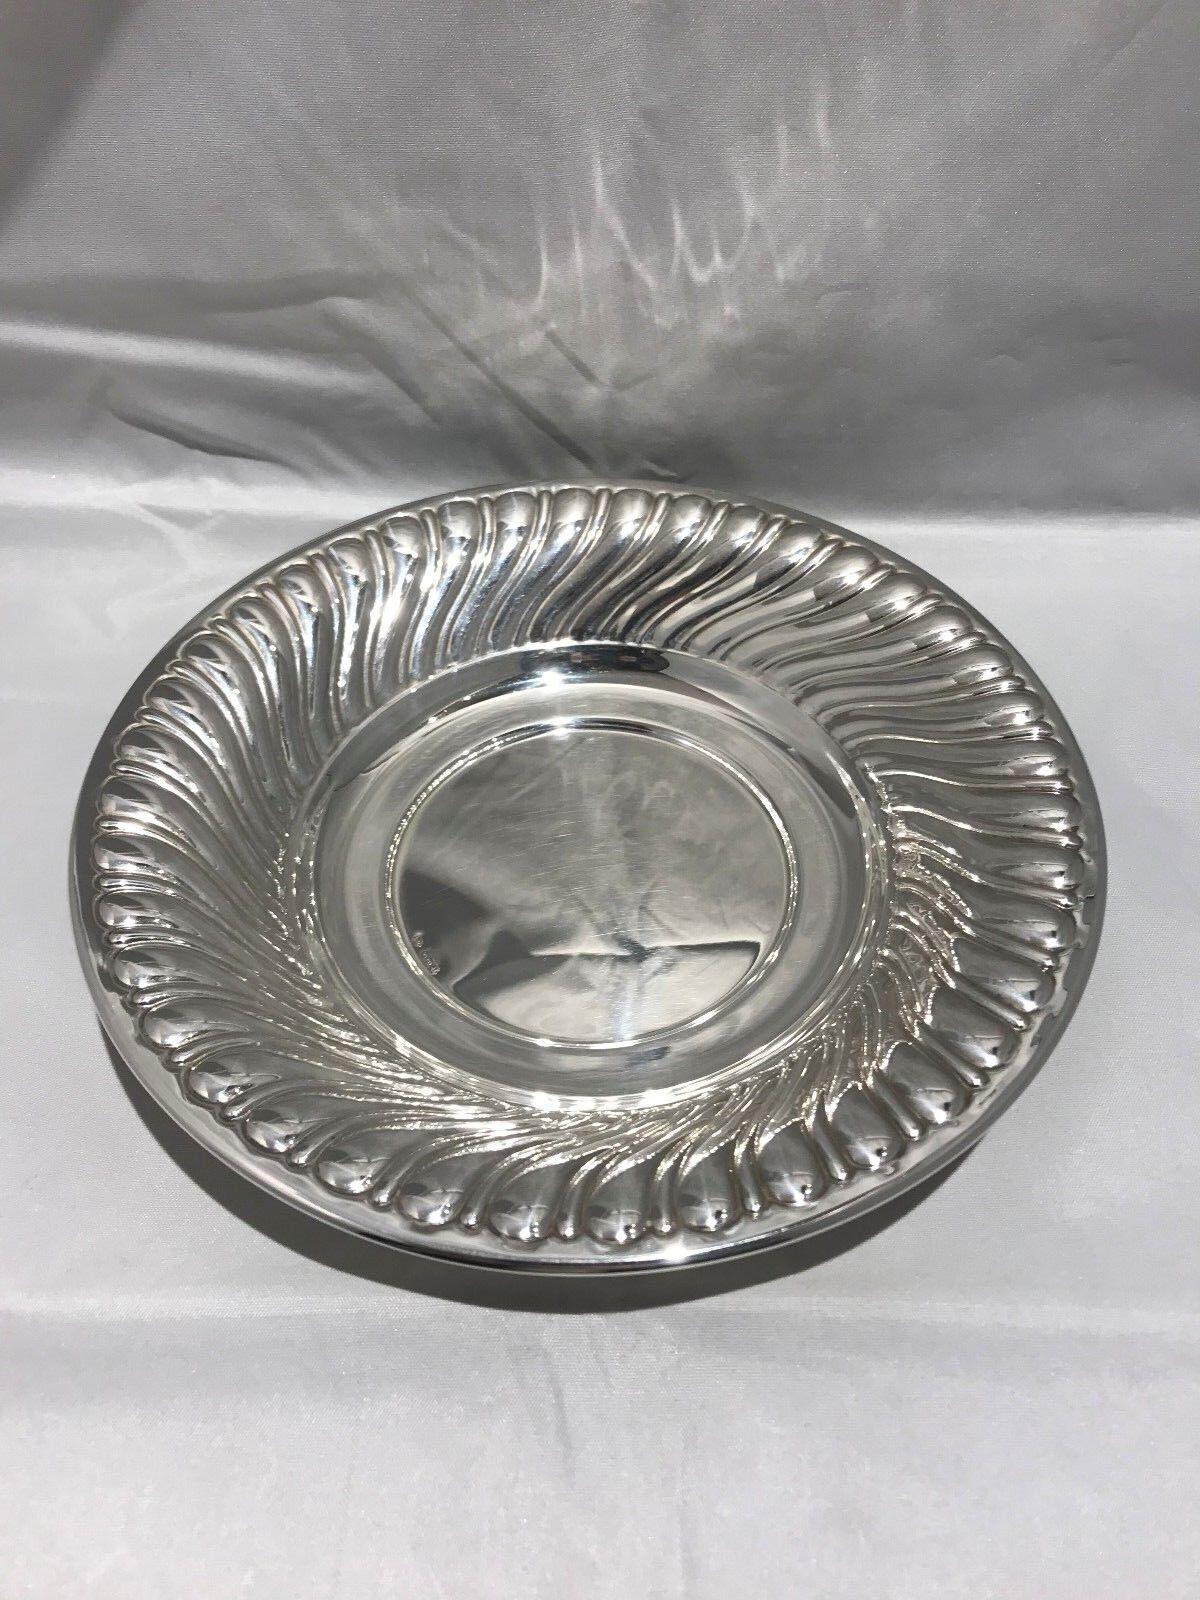 CIOTOLA IN argentoO argentoO argentoO -GIOIELLERIA OTTAVIANI ROMA cadd7d